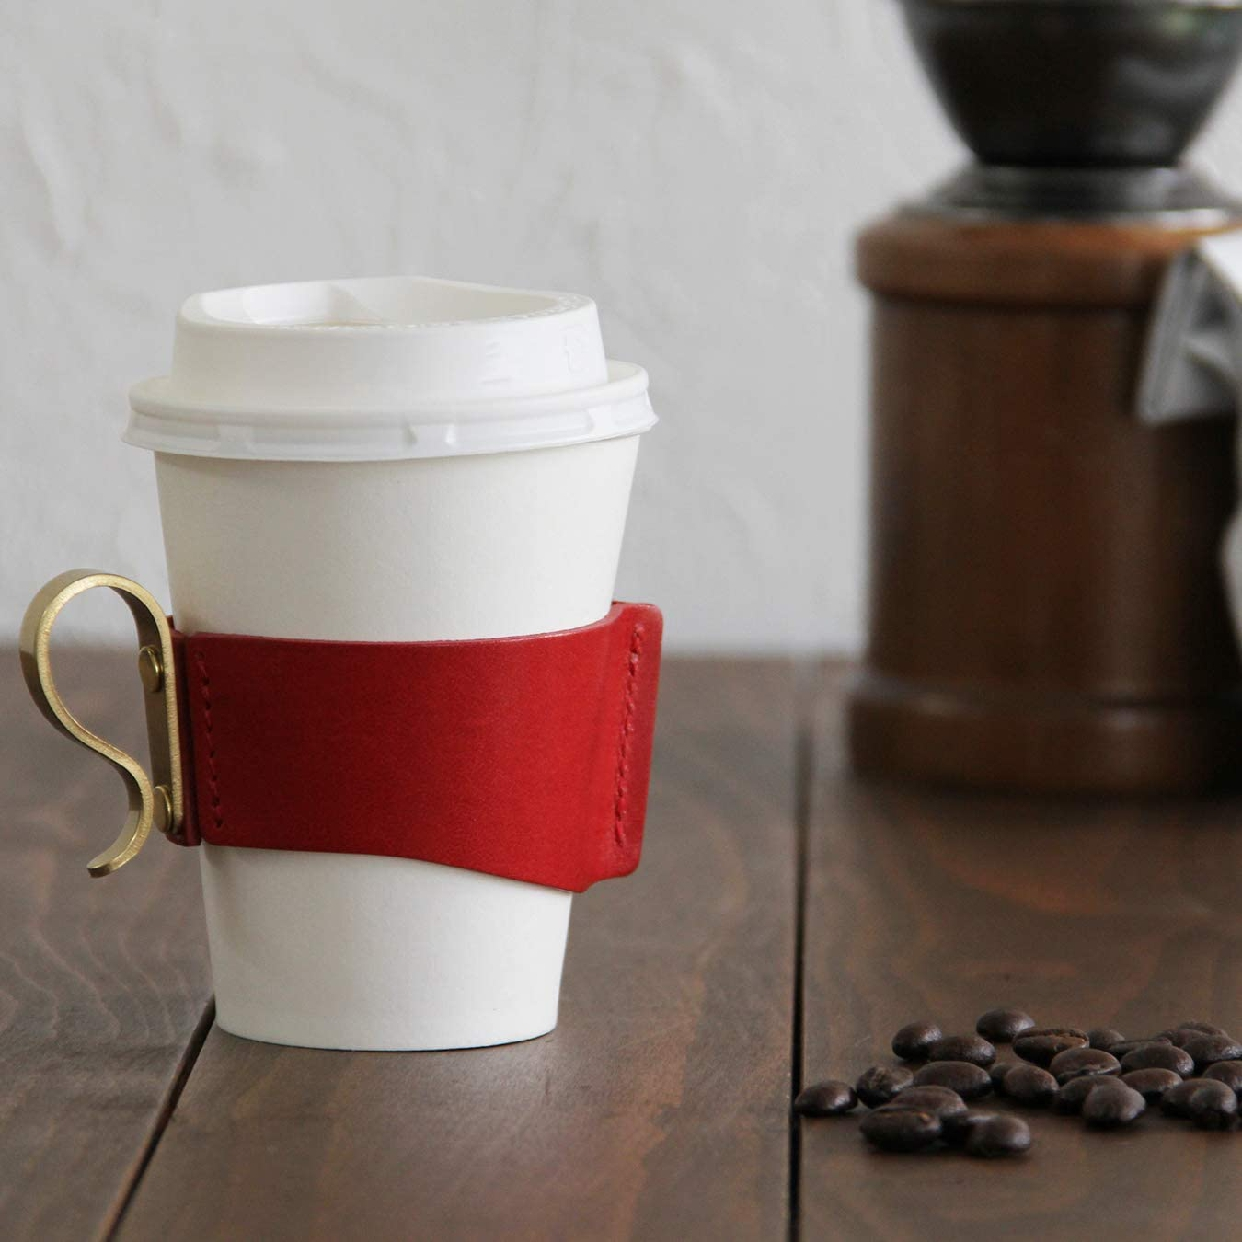 clife(クリフ)coffee and life コーヒースリーブの商品画像5